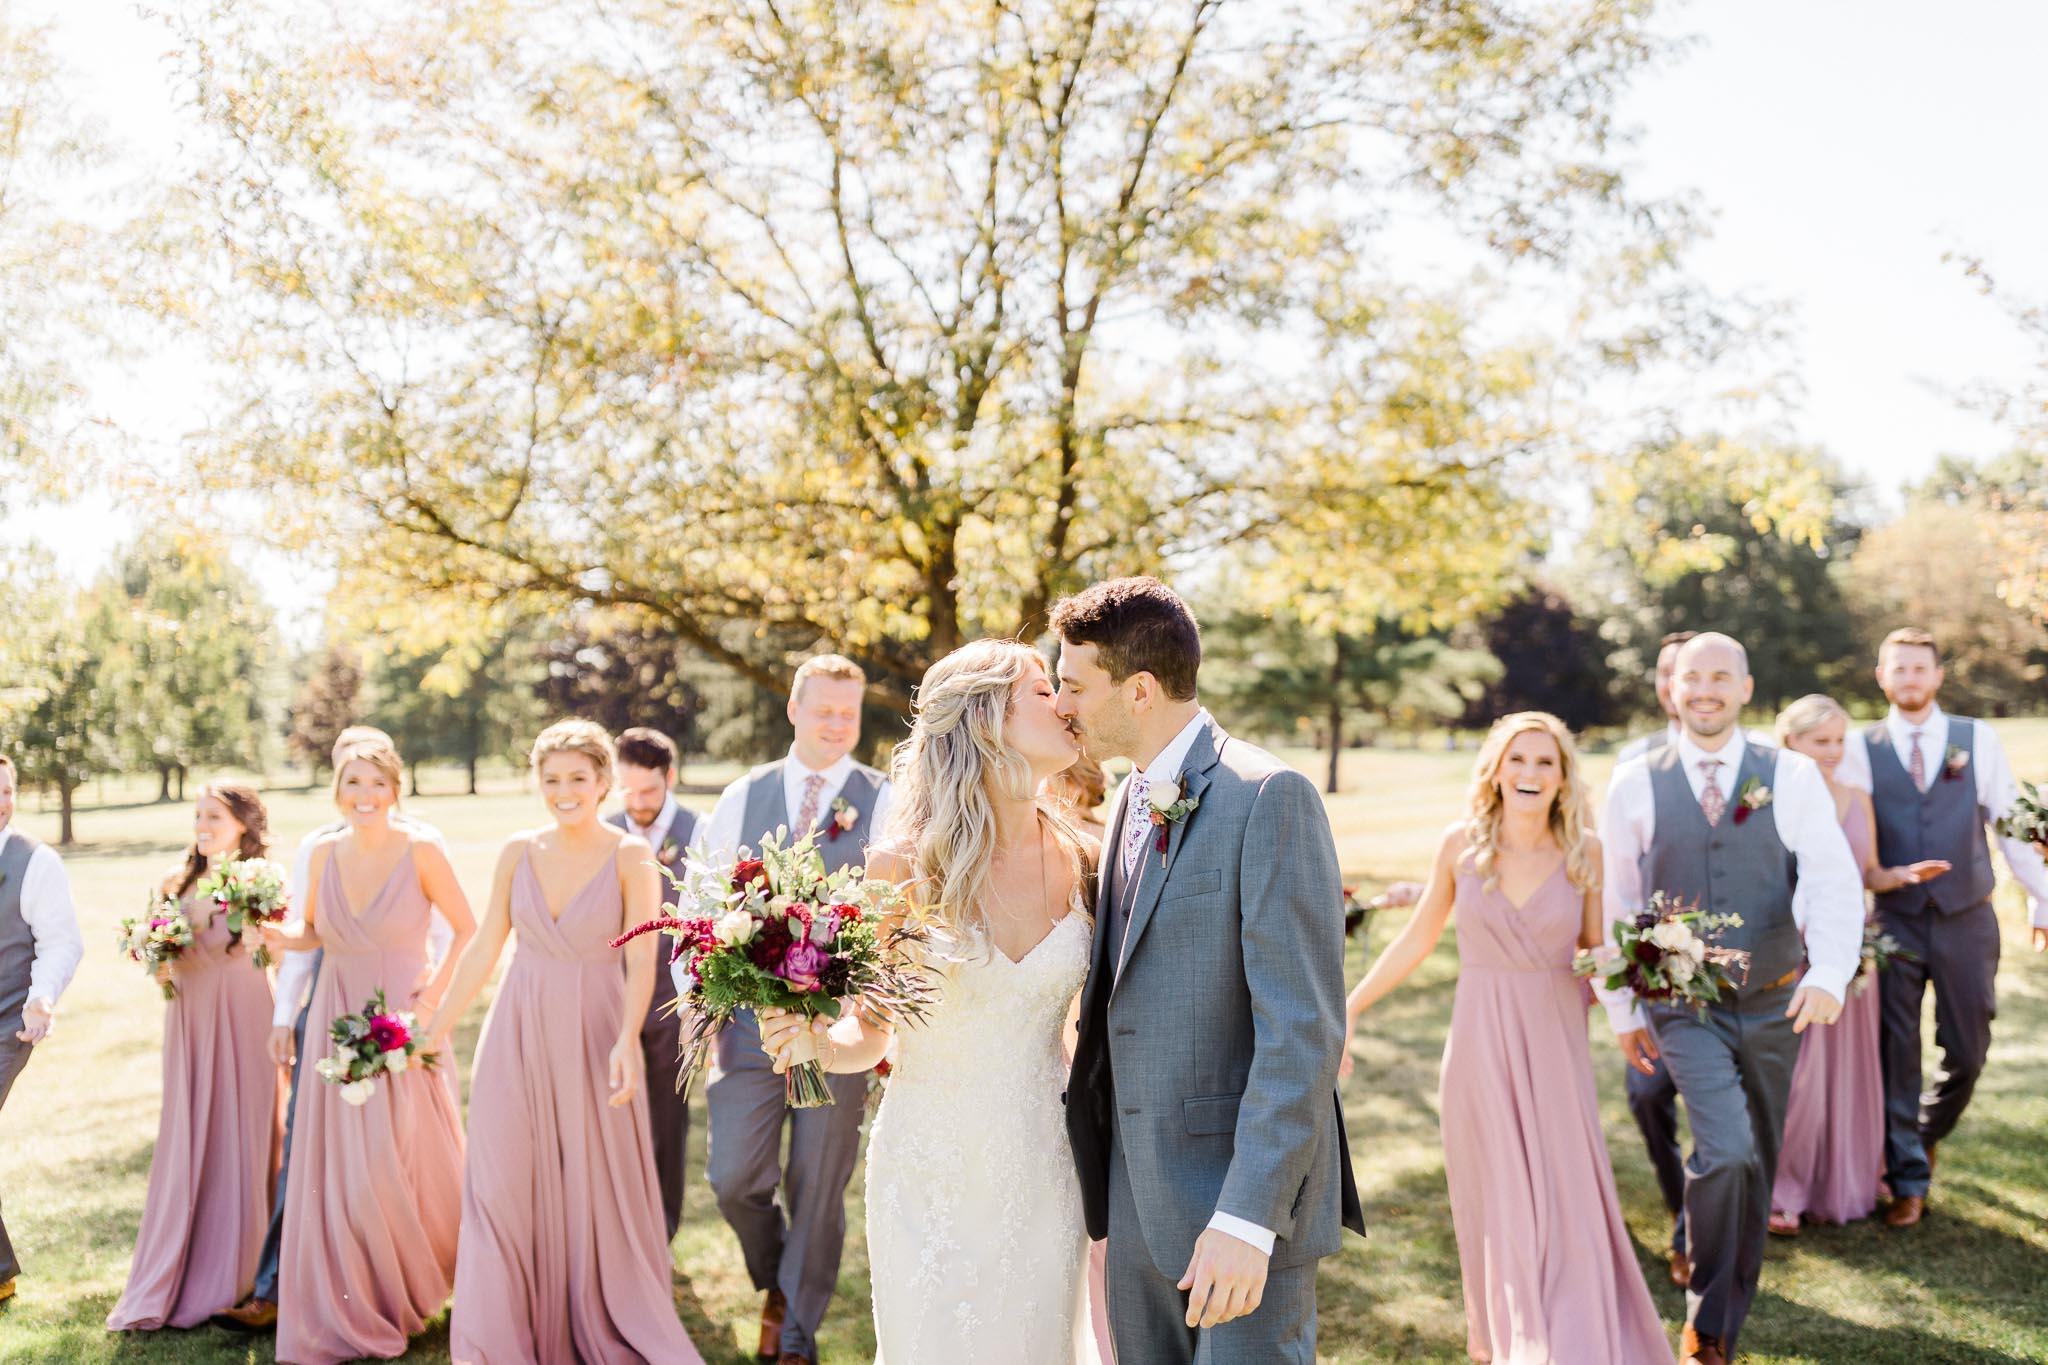 Frosty-Valley-September-Wedding-7464.jpg